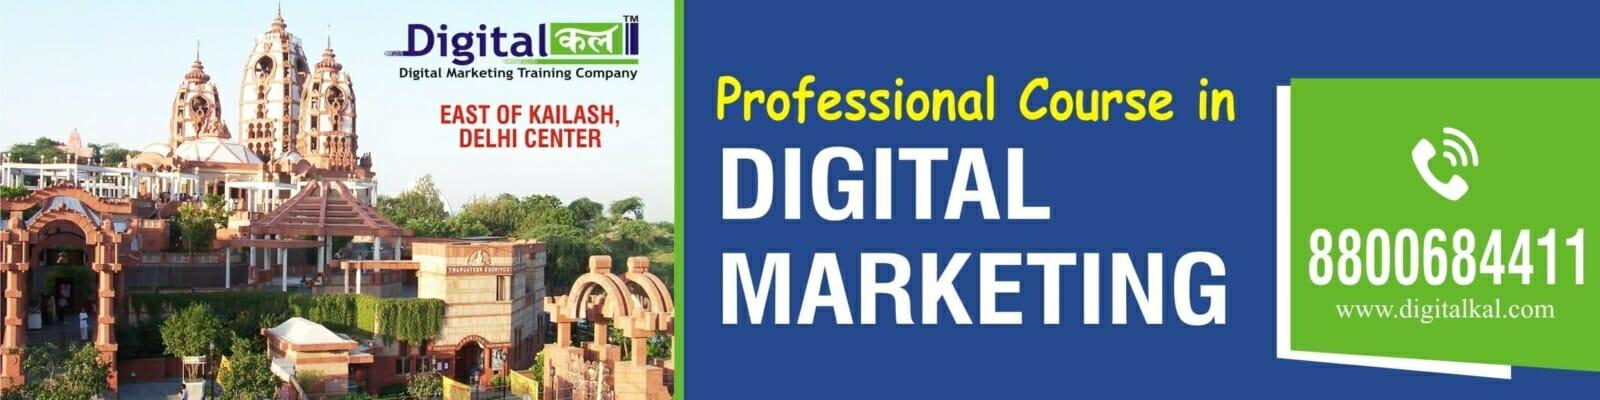 Digital Marketing Training Delhi East of Kailash